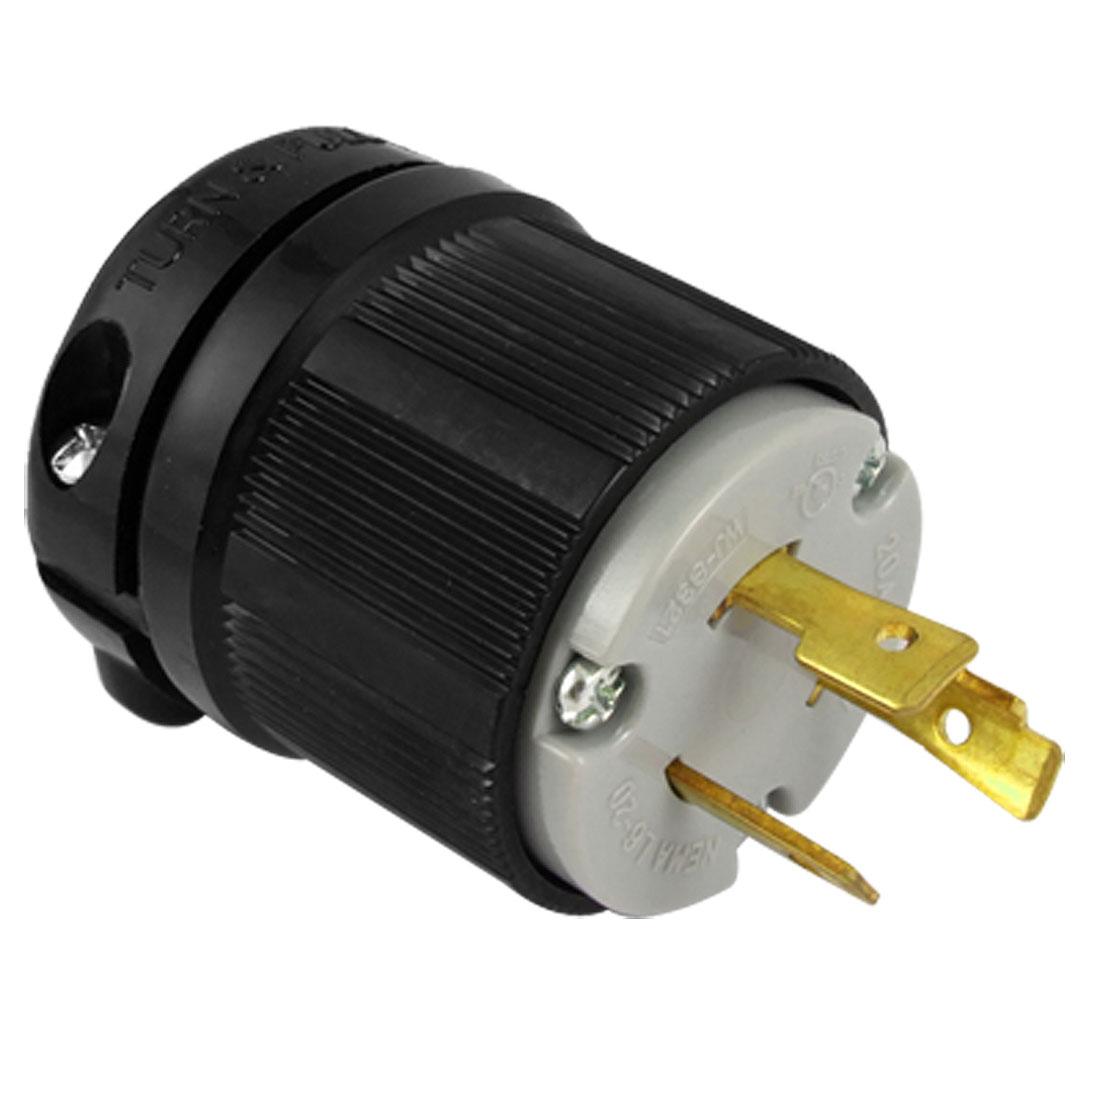 AC 250V 20A Nema L6-20P 3-Prong Twist Lock Male Replacement Plug